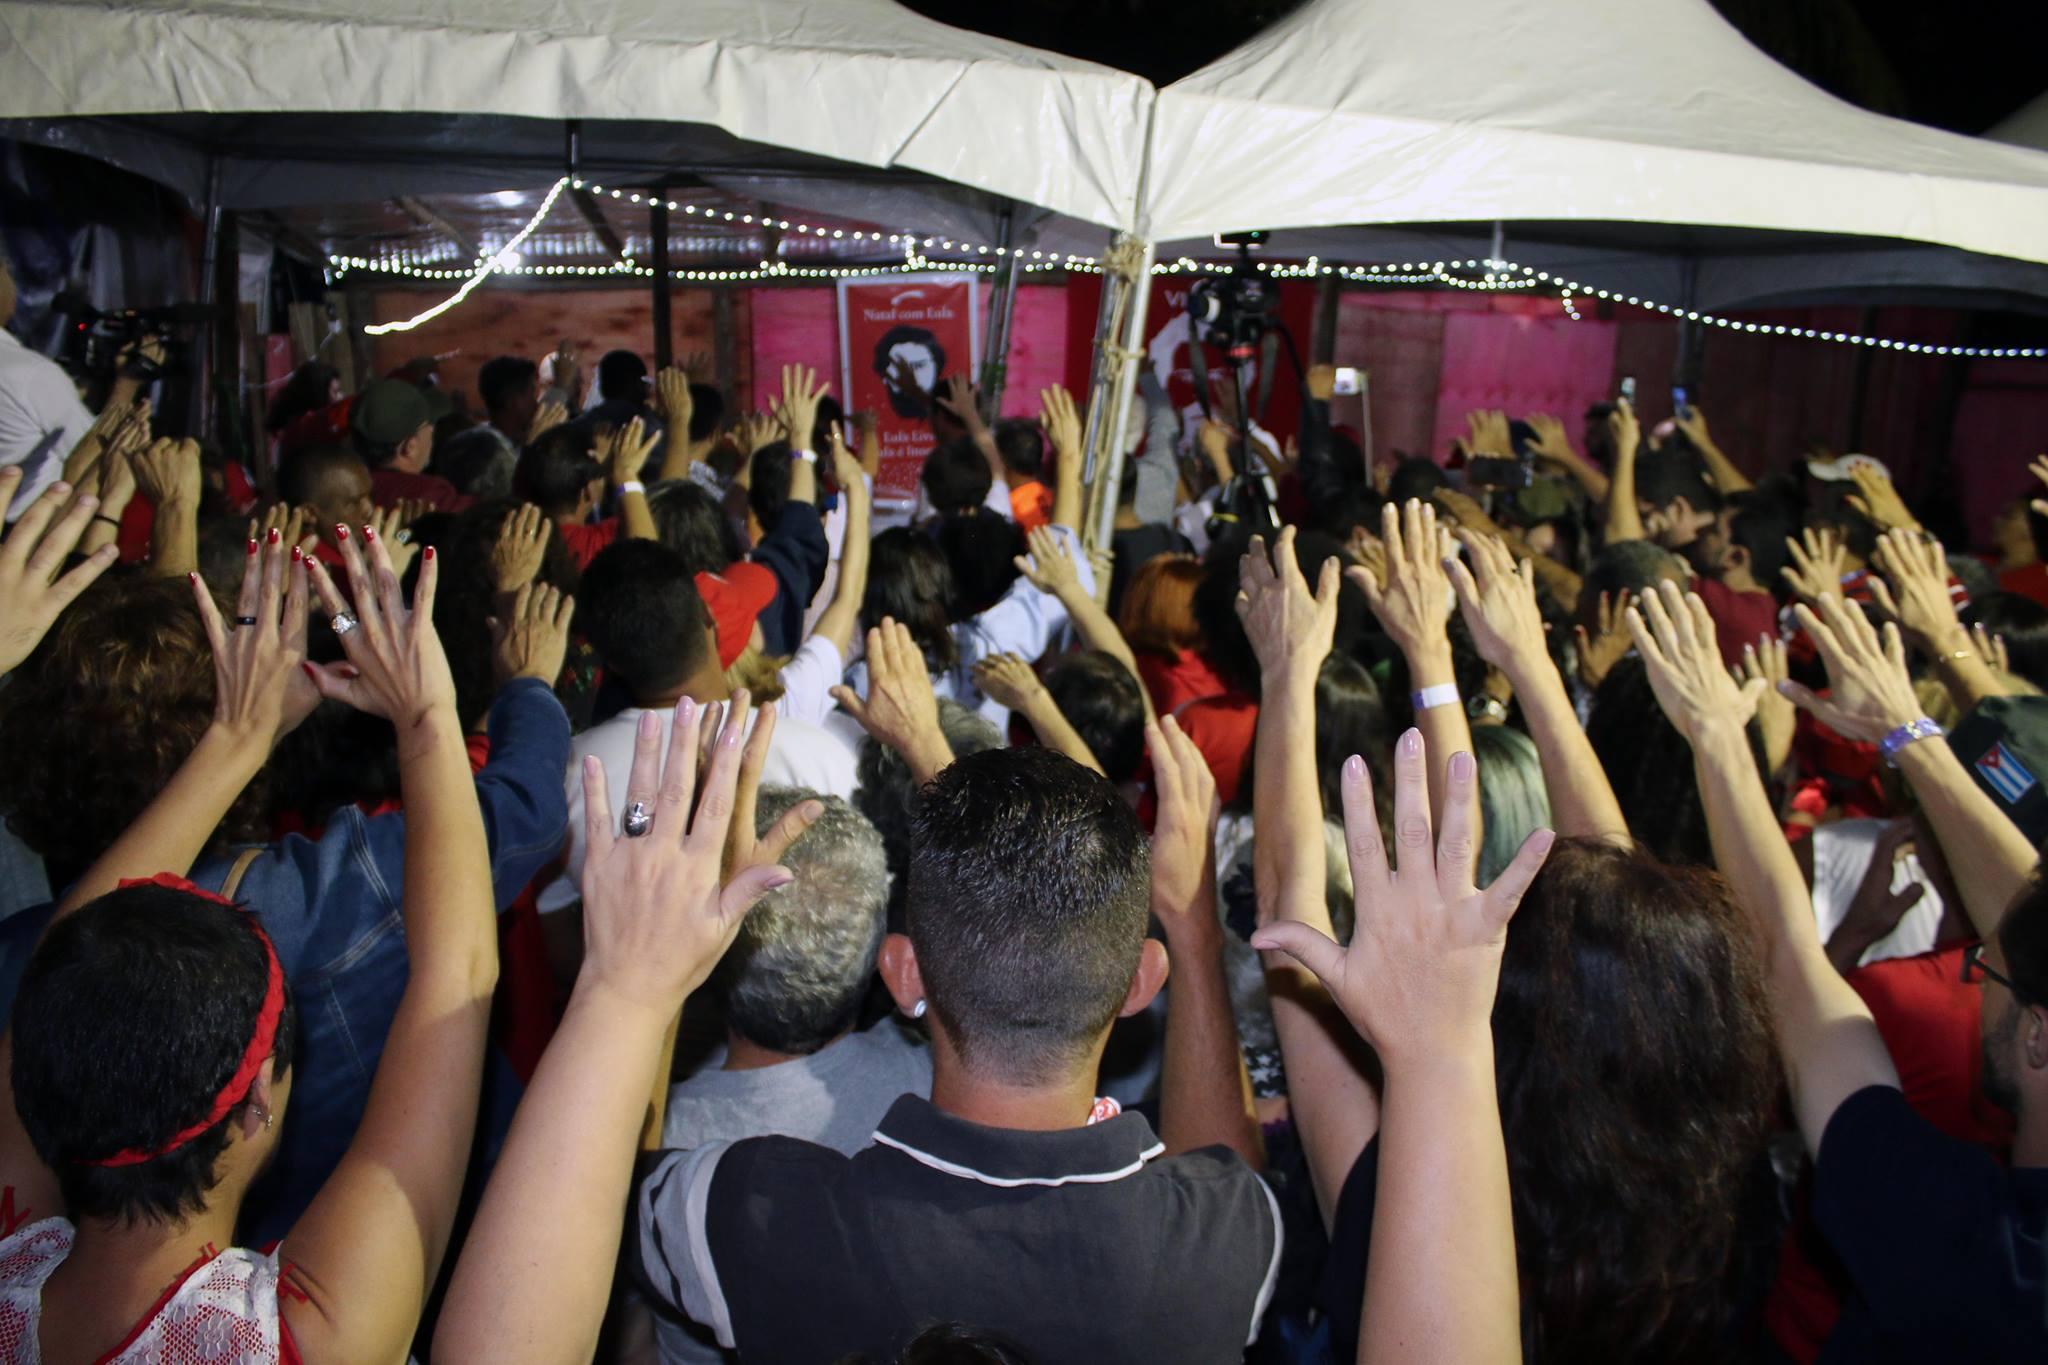 FOTO31-Jornalistas Livres